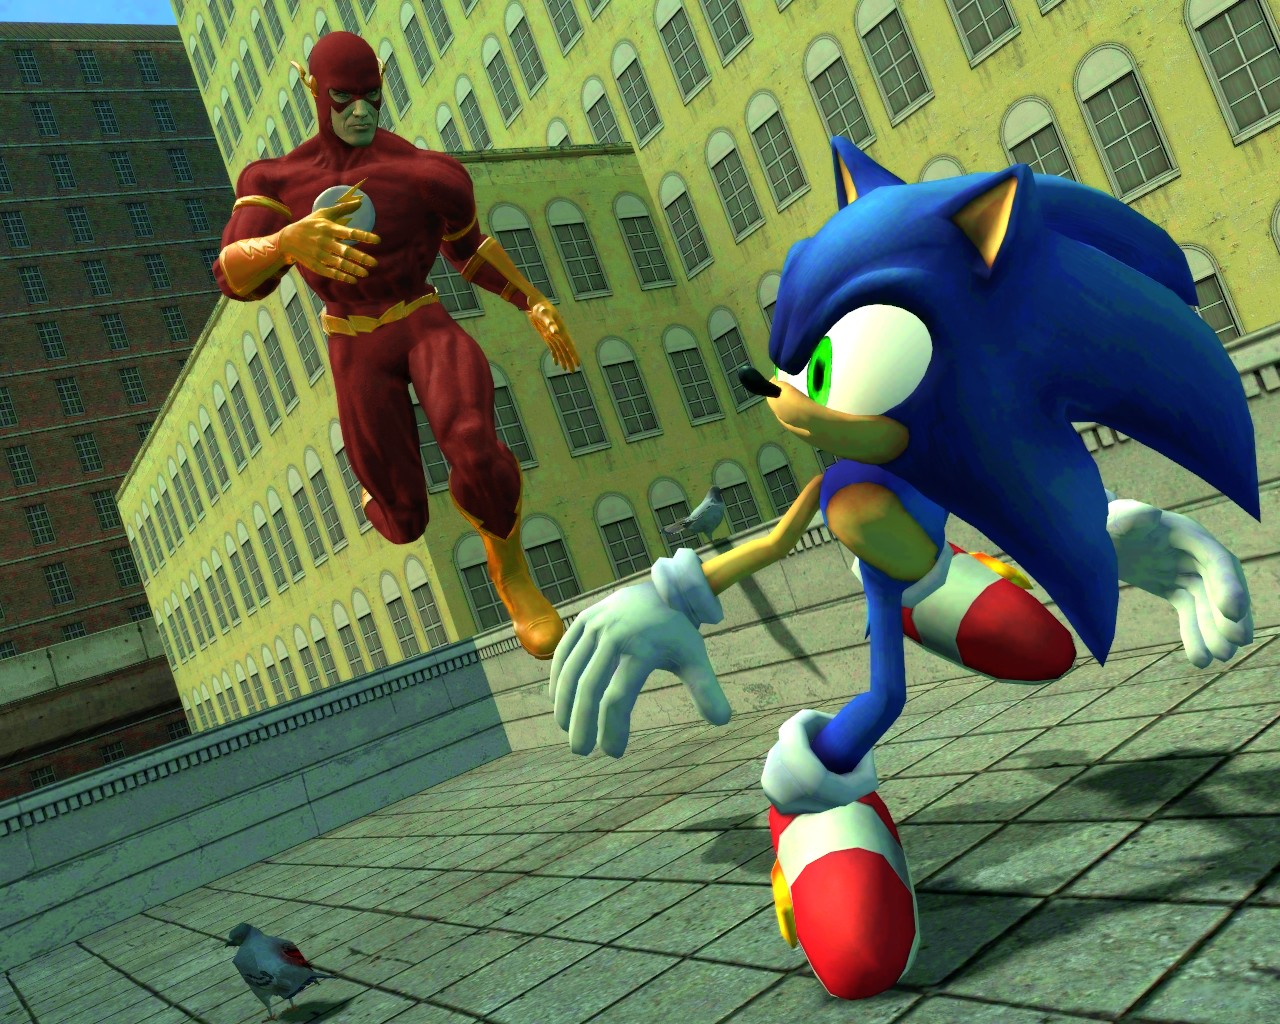 flash vs sonic - photo #37